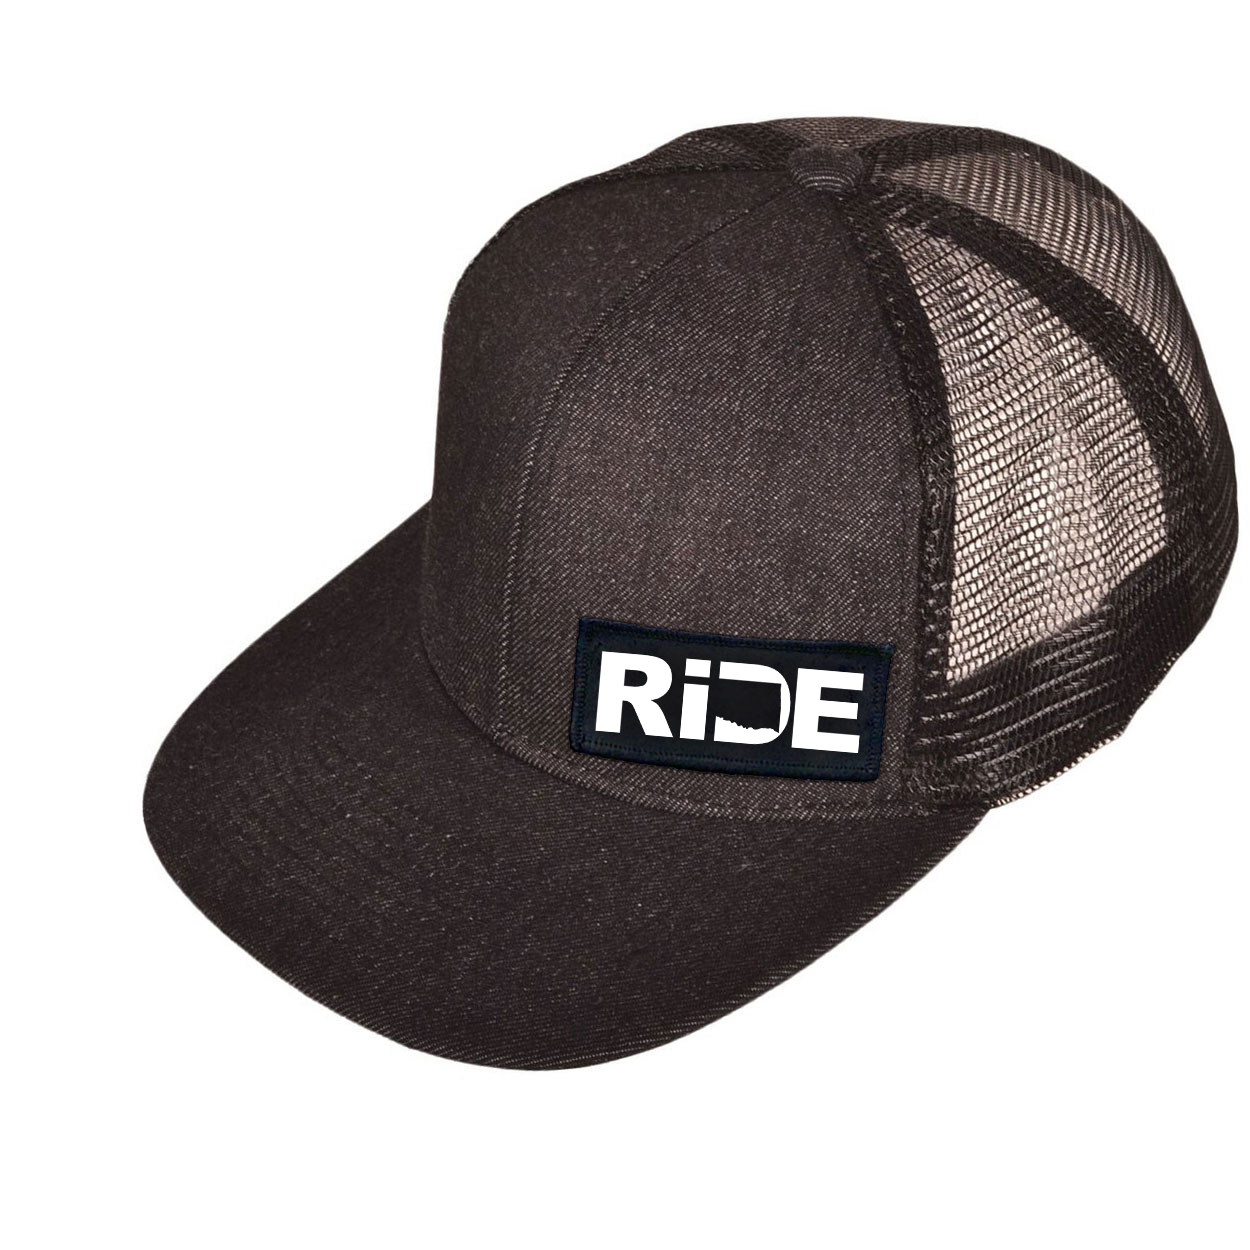 Ride Oklahoma Night Out Woven Patch Snapback Flat Brim Hat Black Denim (White Logo)